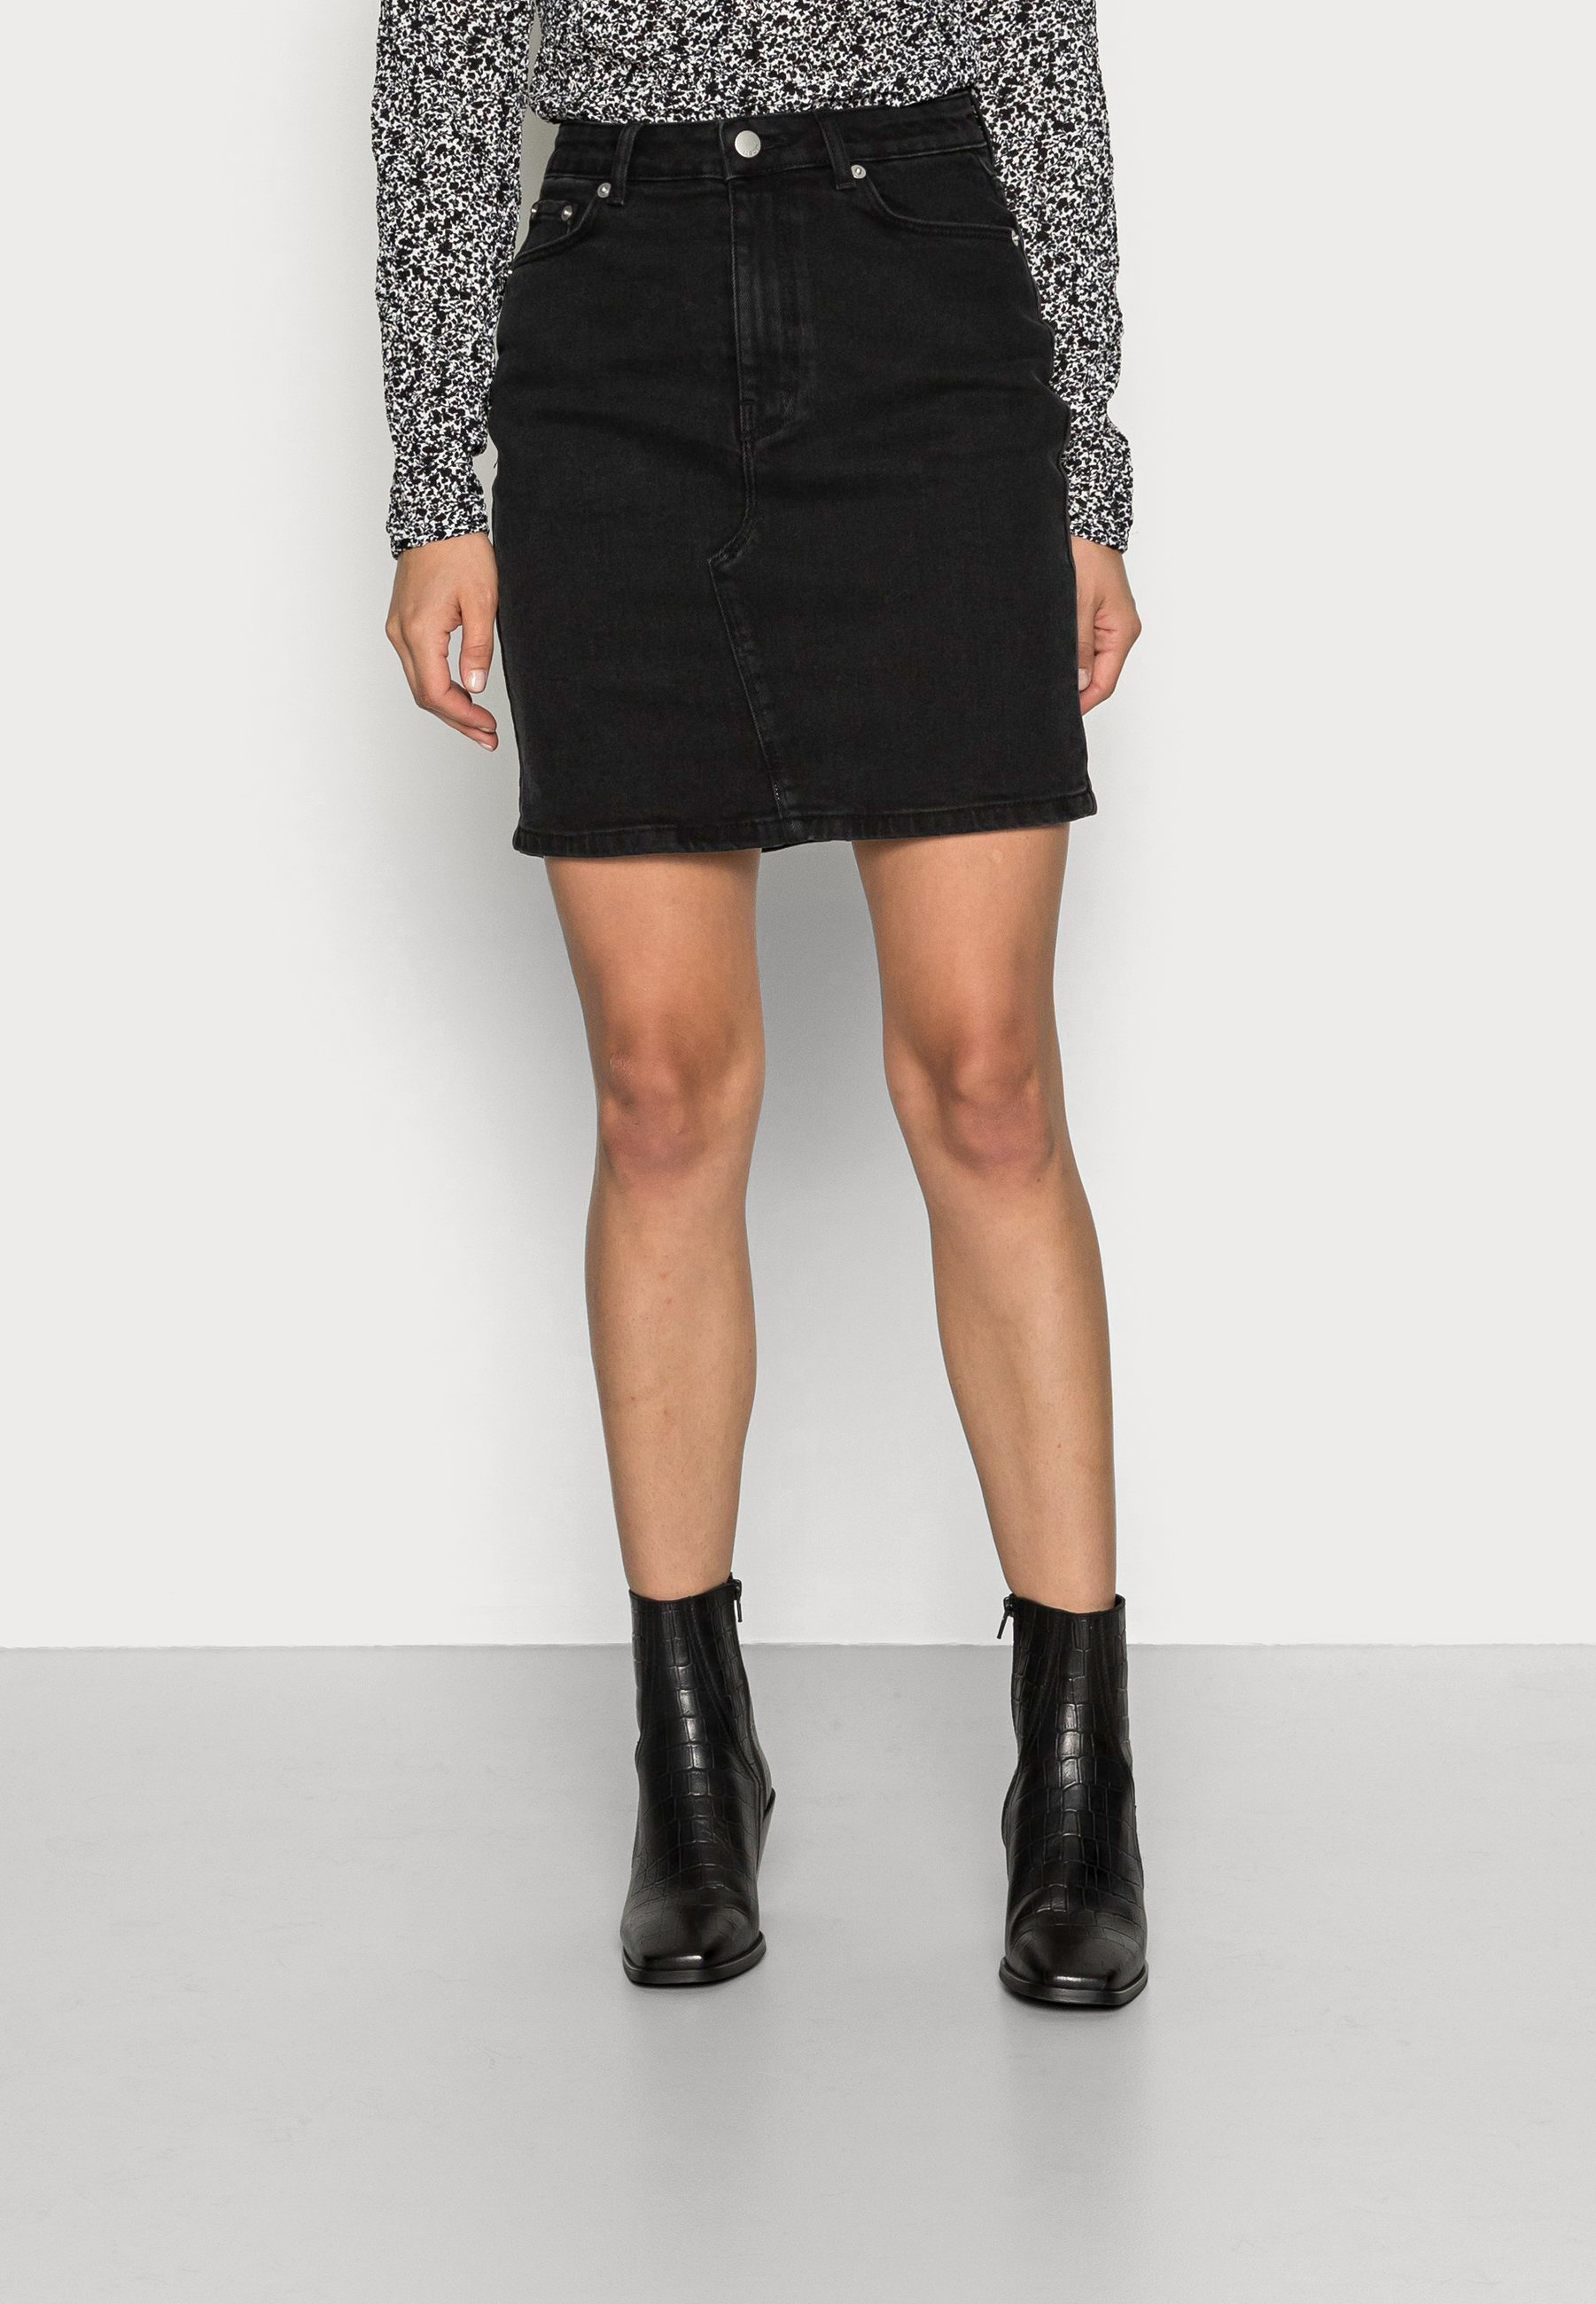 Femme EIKE RIKKA SKIRT - Jupe en jean